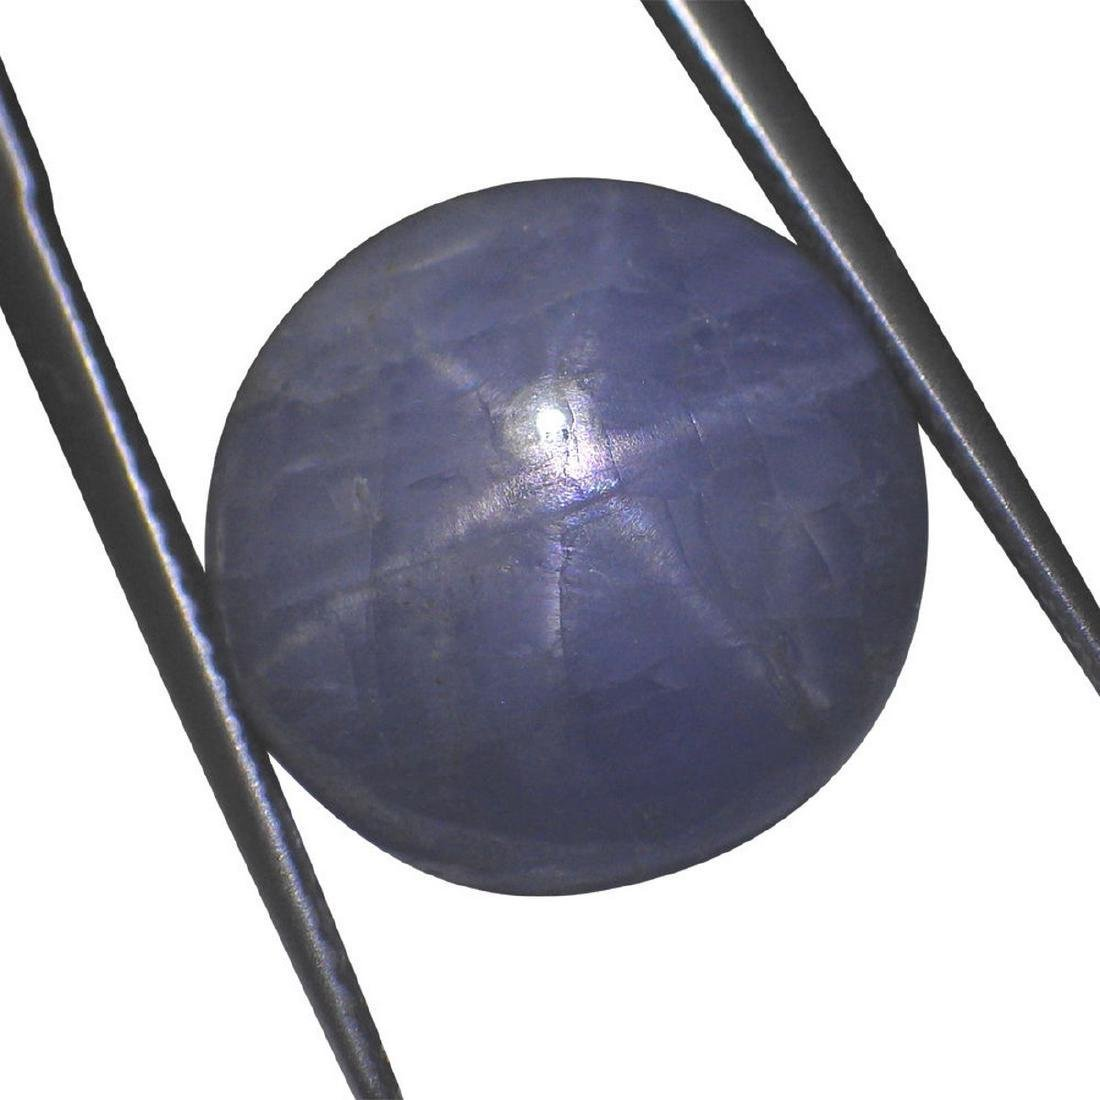 7.46 Carat Loose Round Star Sapphire - 7